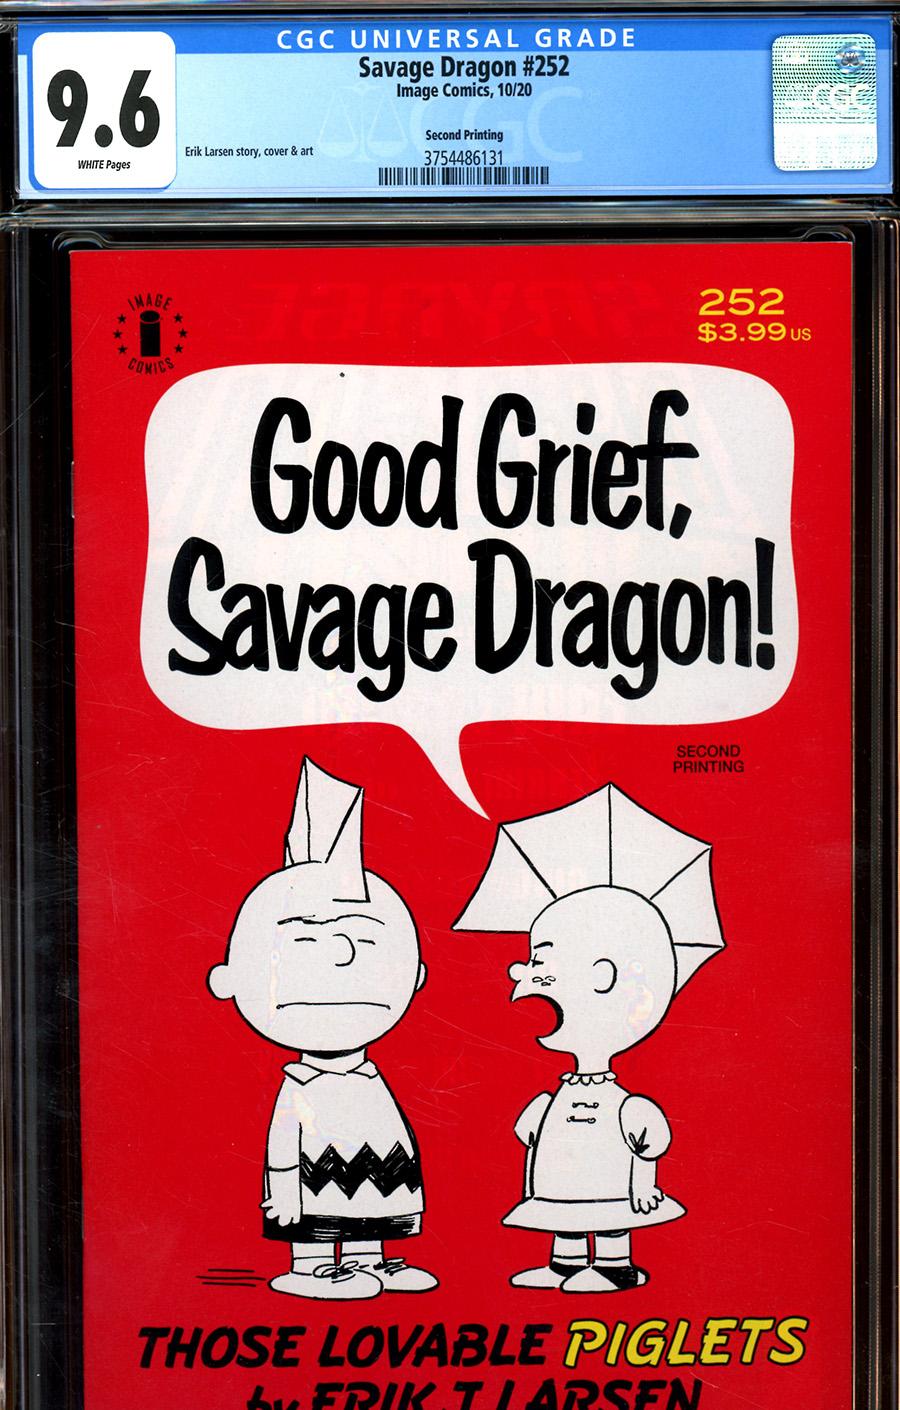 Savage Dragon Vol 2 #252 Cover C DF 2nd Ptg CGC Graded